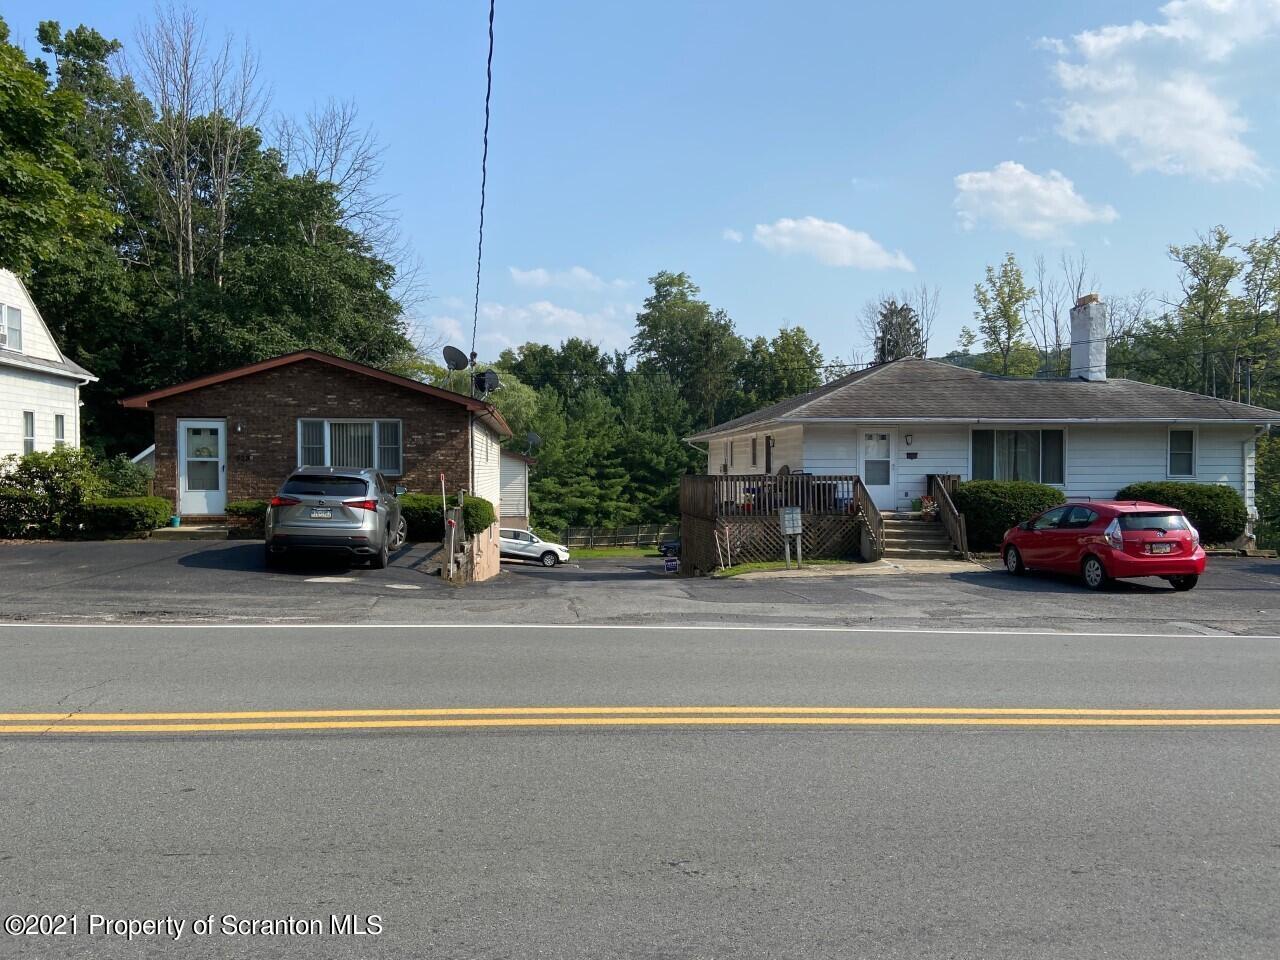 525 Winola Rd., Clarks Summit, Pennsylvania 18411, ,Multi-Family,For Sale,Winola,21-3286